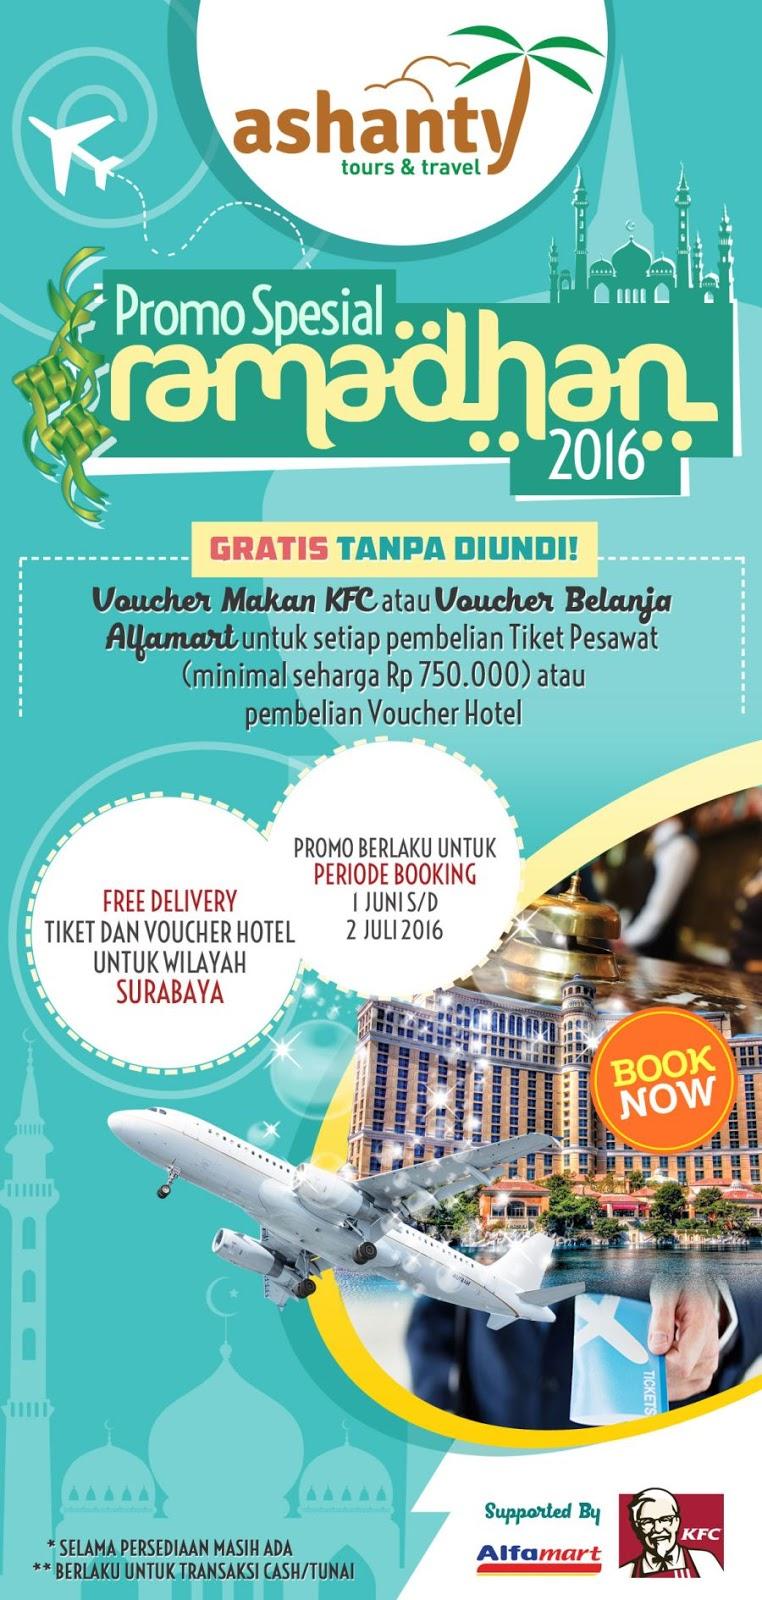 promo jual tiket pesawat online dan voucher hotel surabaya